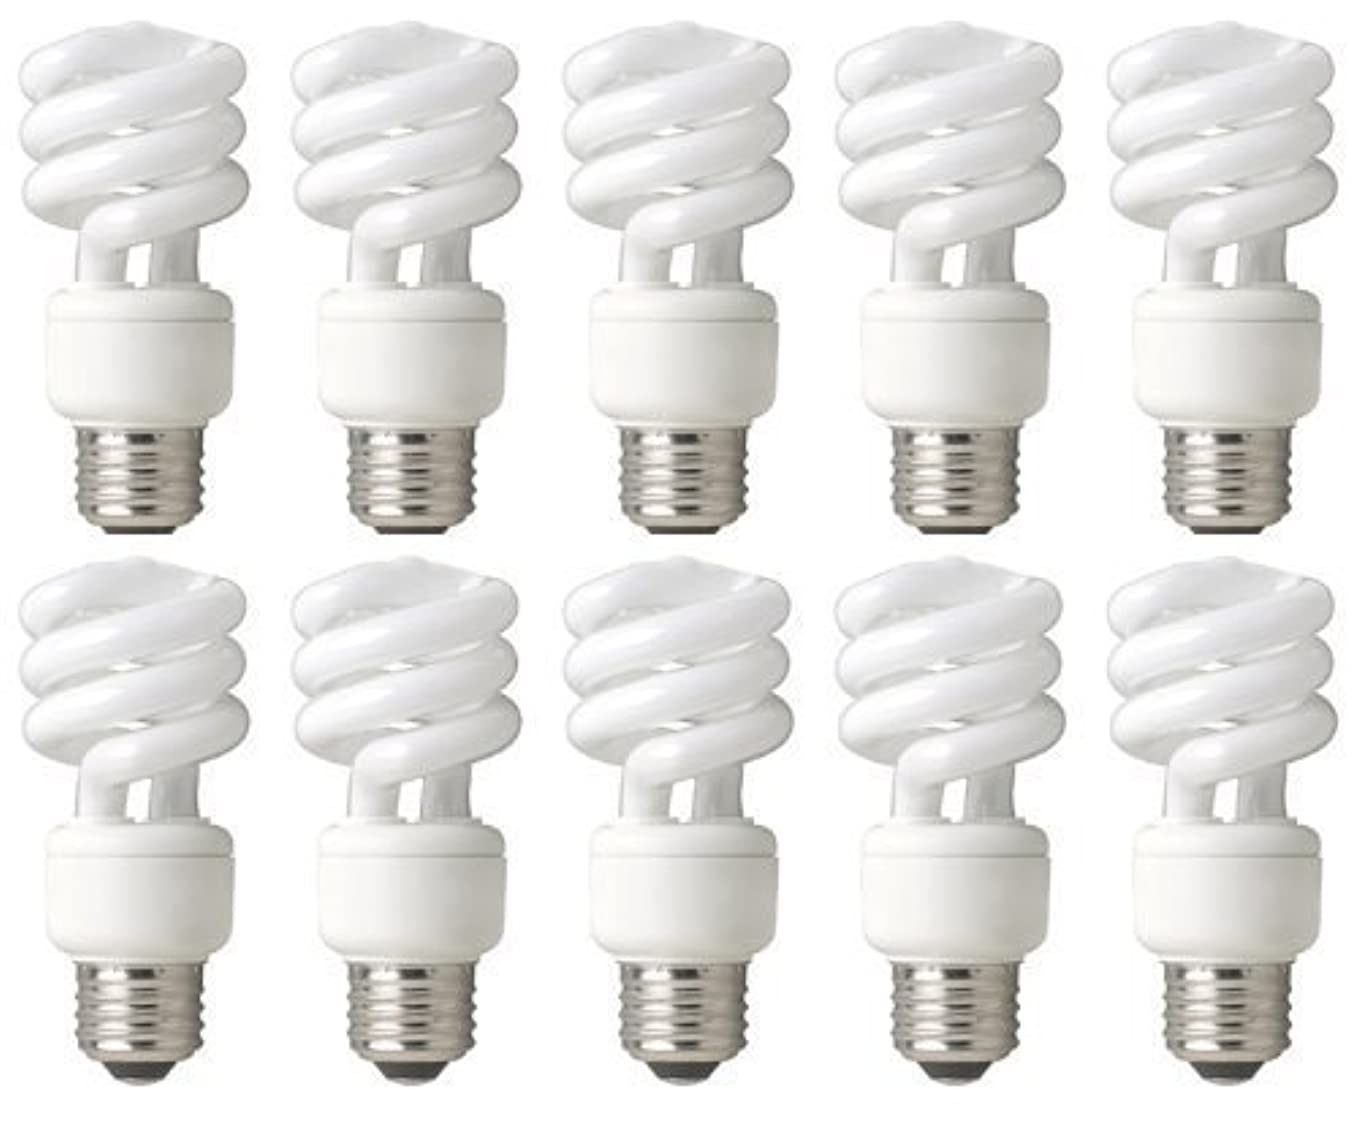 TCP 68914B10 CFL Mini Spring A Lamp - 60 Watt Equivalent (only 14W used) Soft White (2700k) Spiral Light Bulb - 10 pack